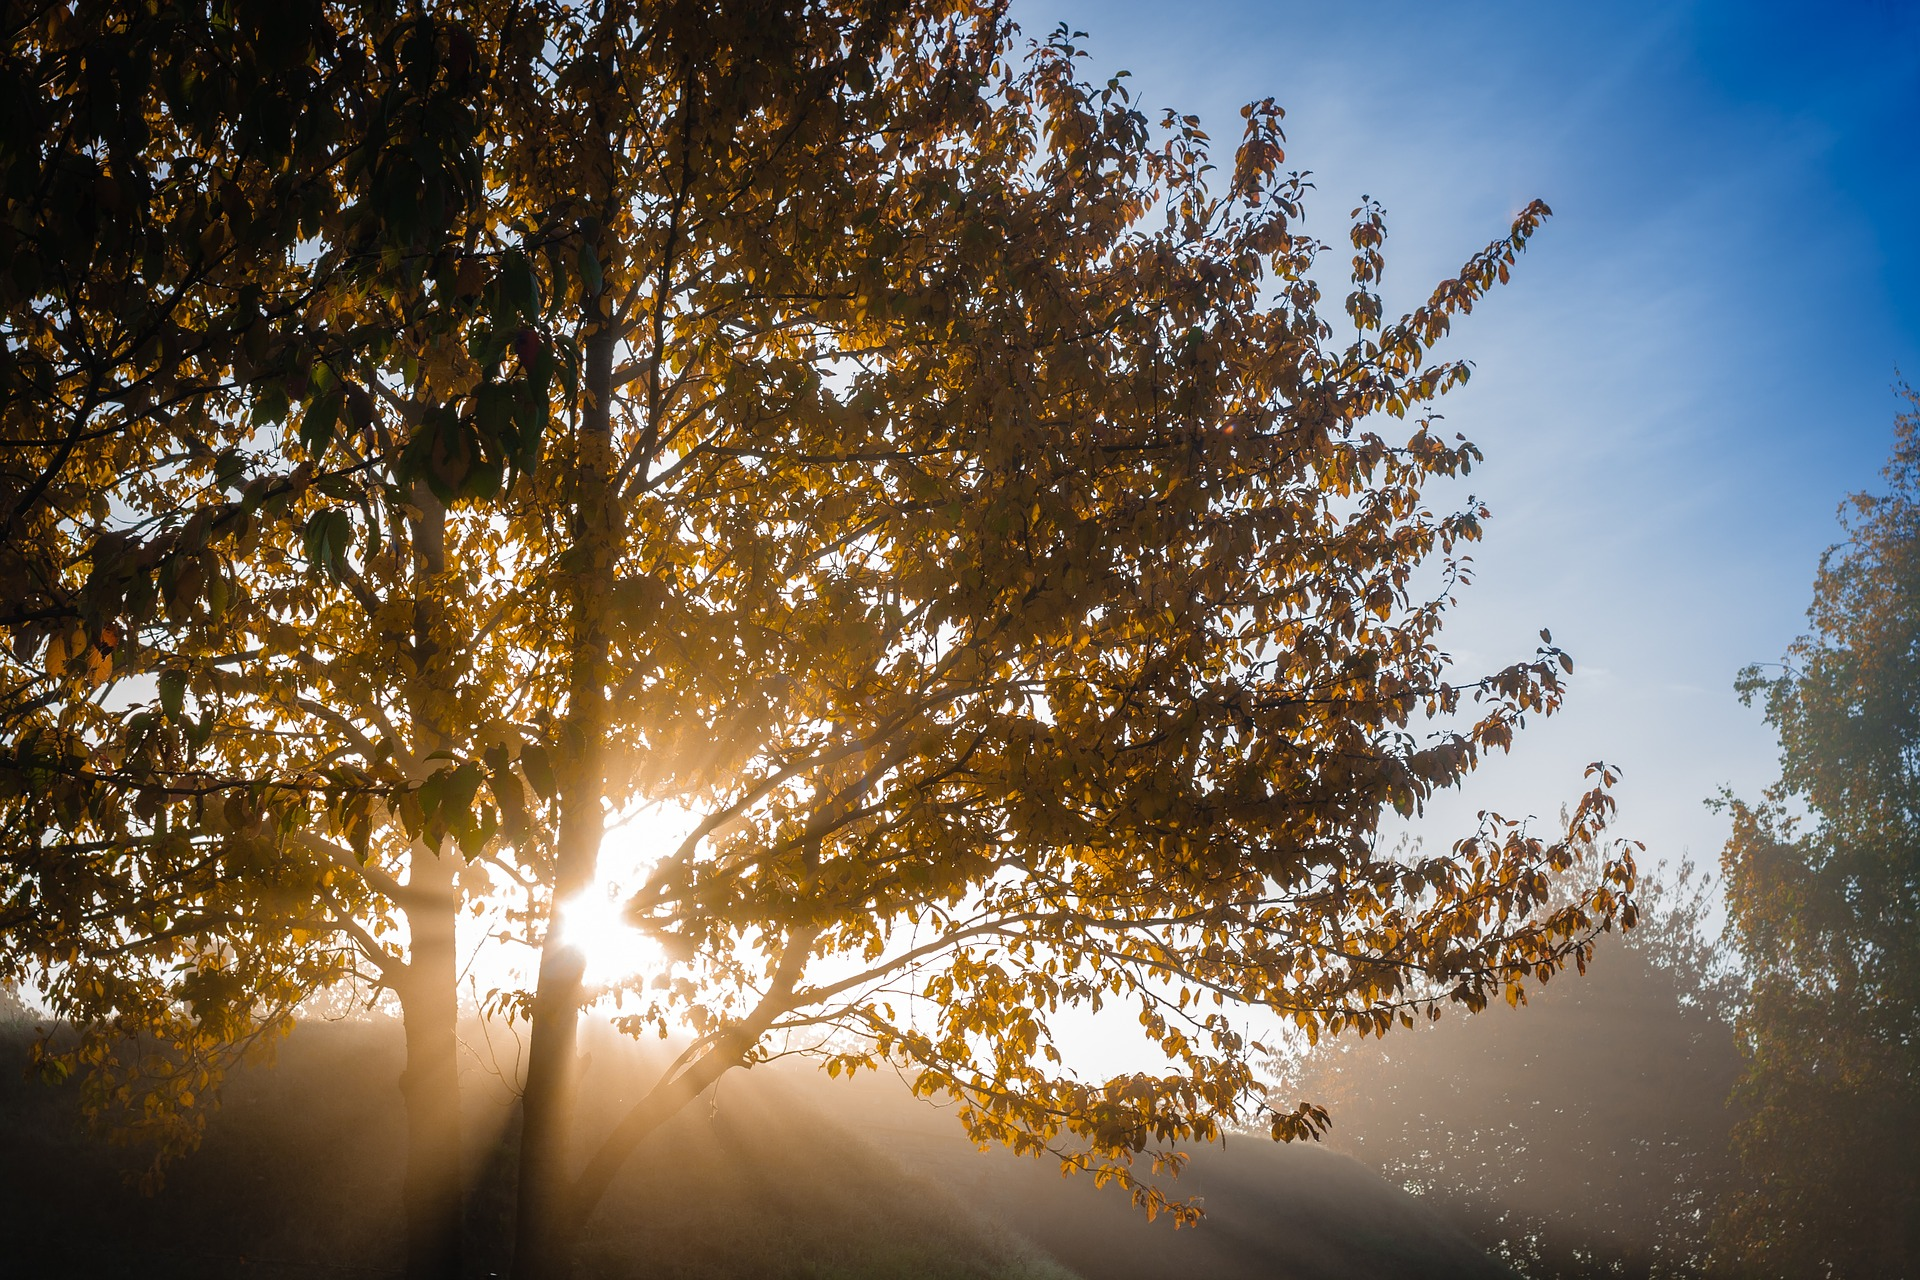 God's Goodness: In Human Destiny -